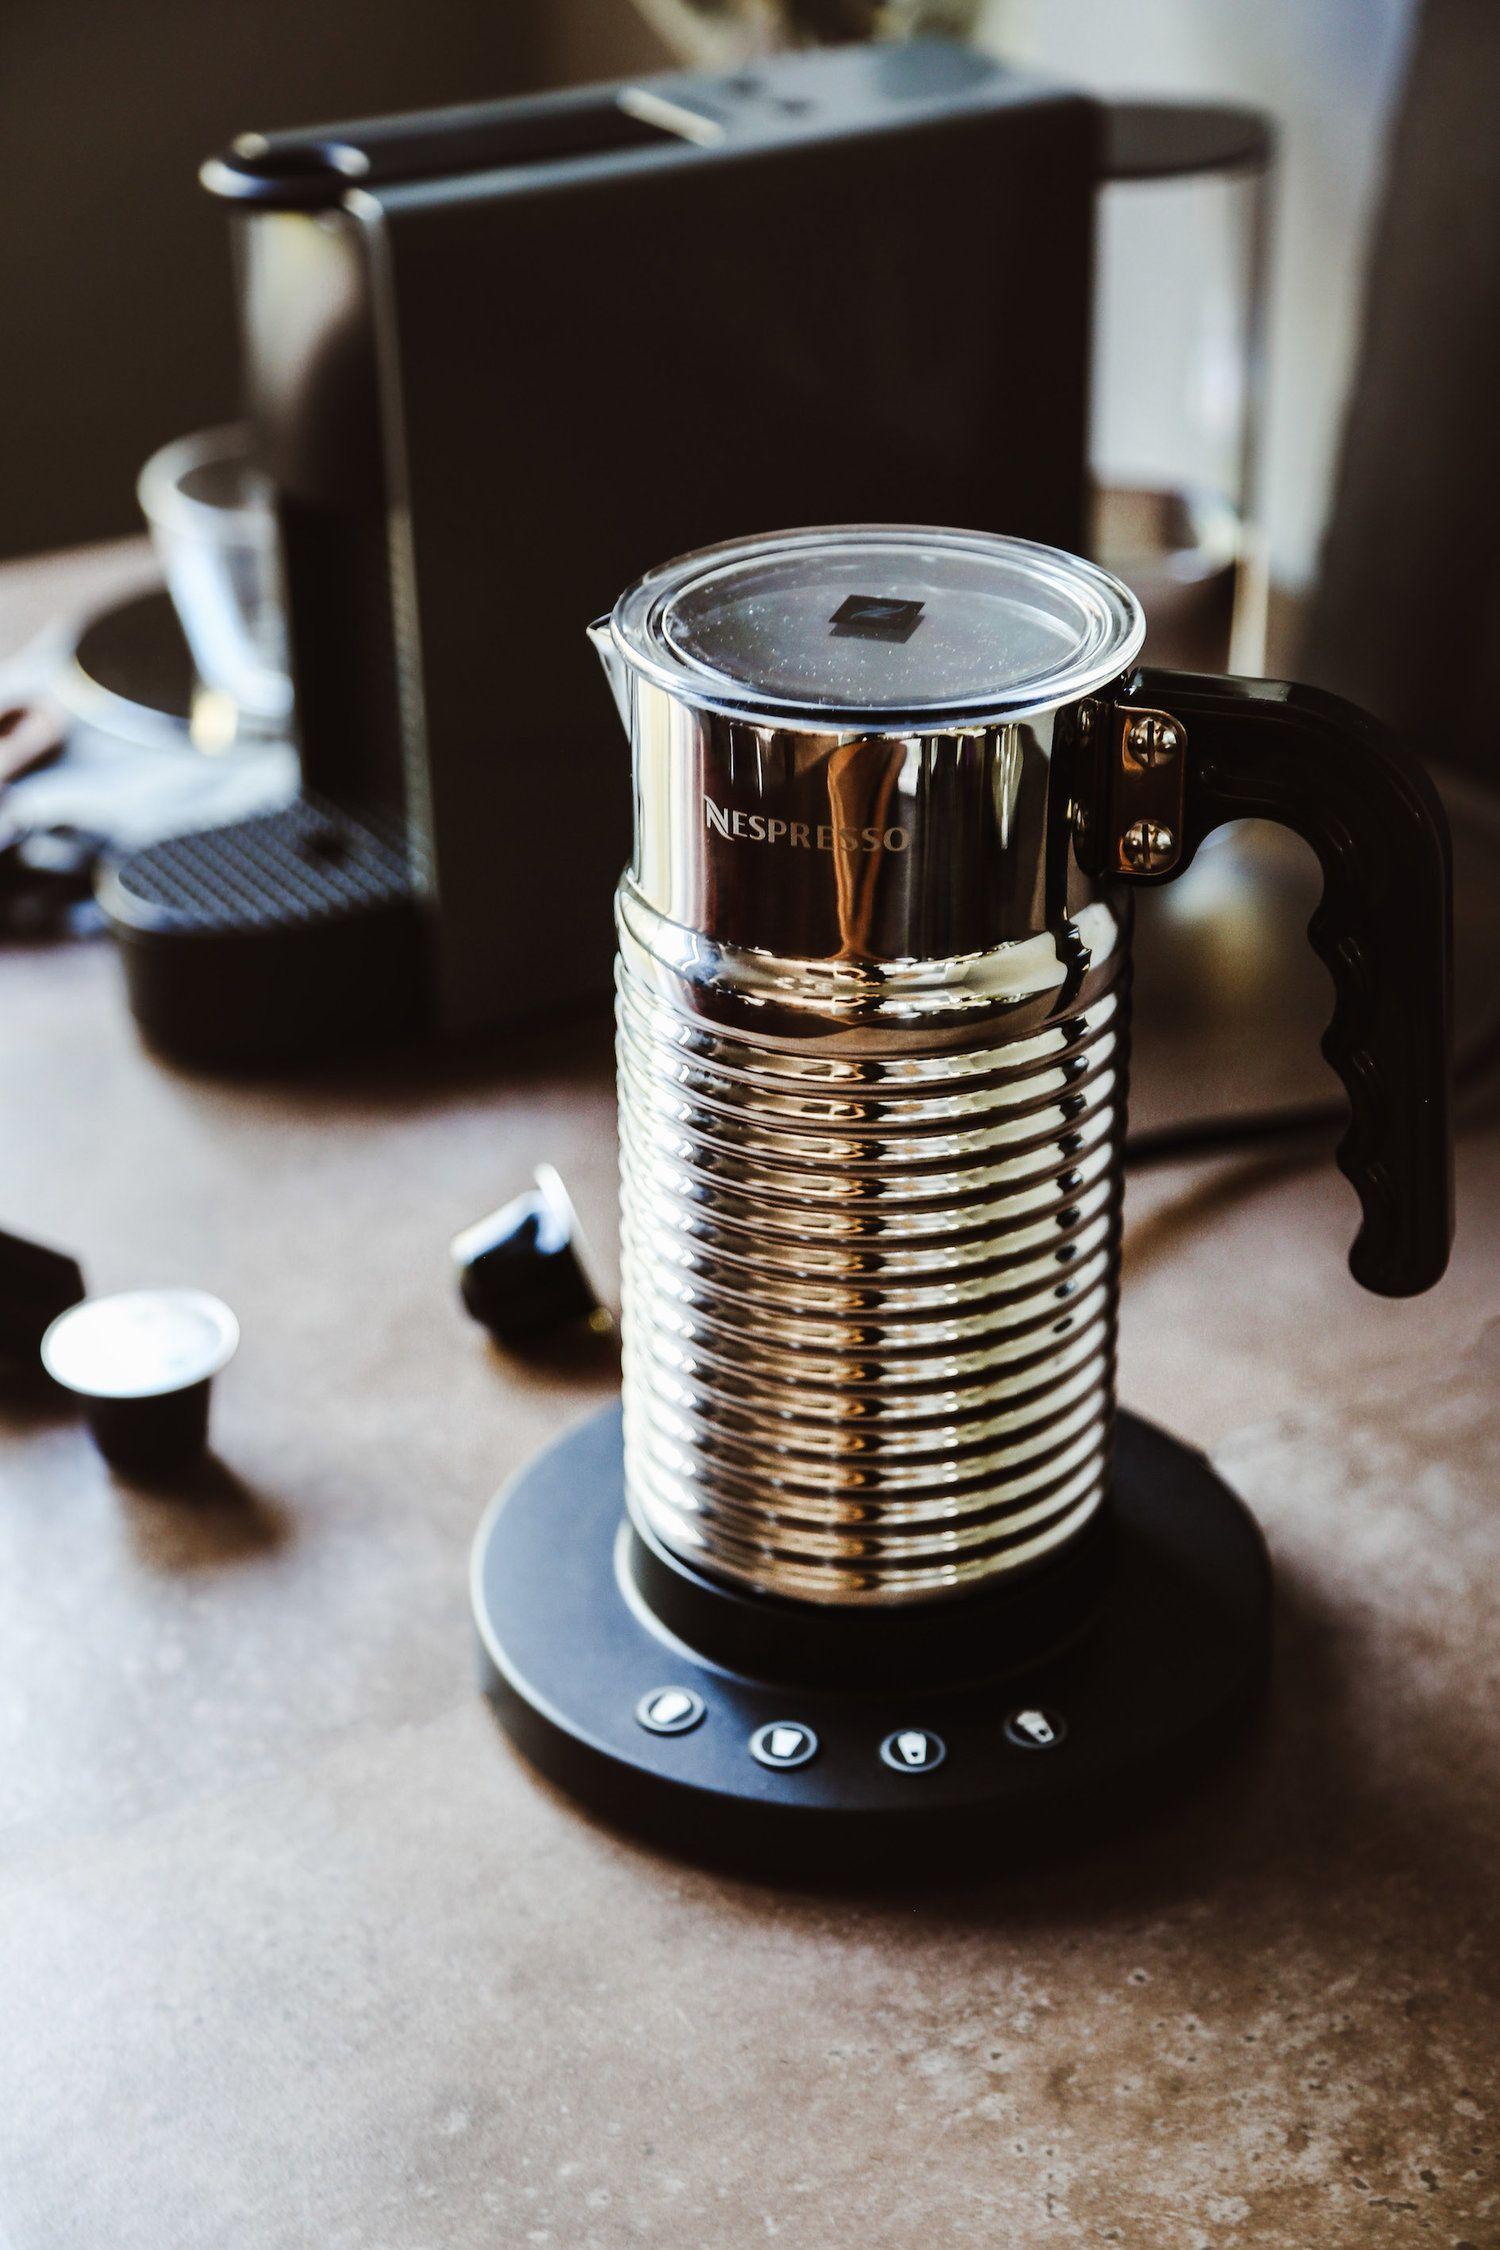 Nespresso Aeroccino Recipes Nespresso recipes, Coffee